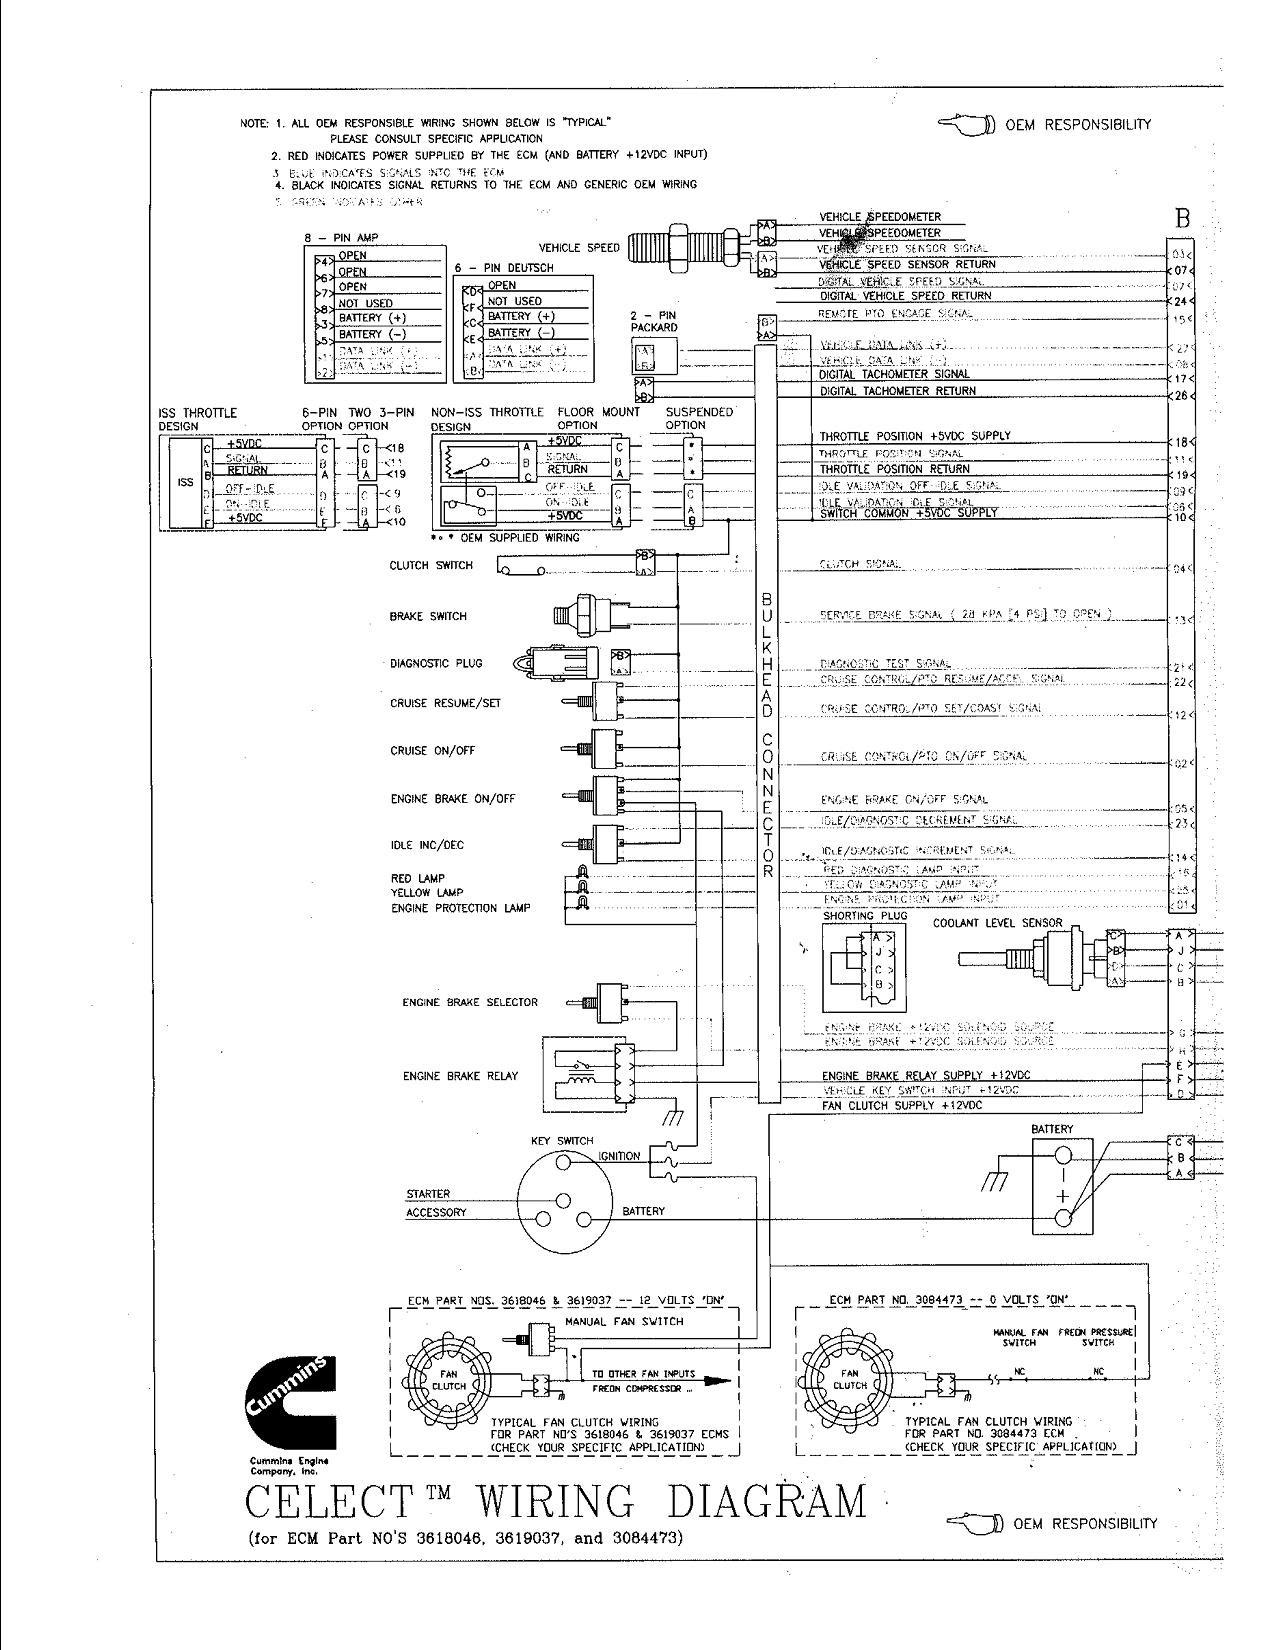 W900 Cummins Engine Wiring Harness Diagram 5 9 Cummins Wiring Diagram Begeboy Wiring Diagram Source